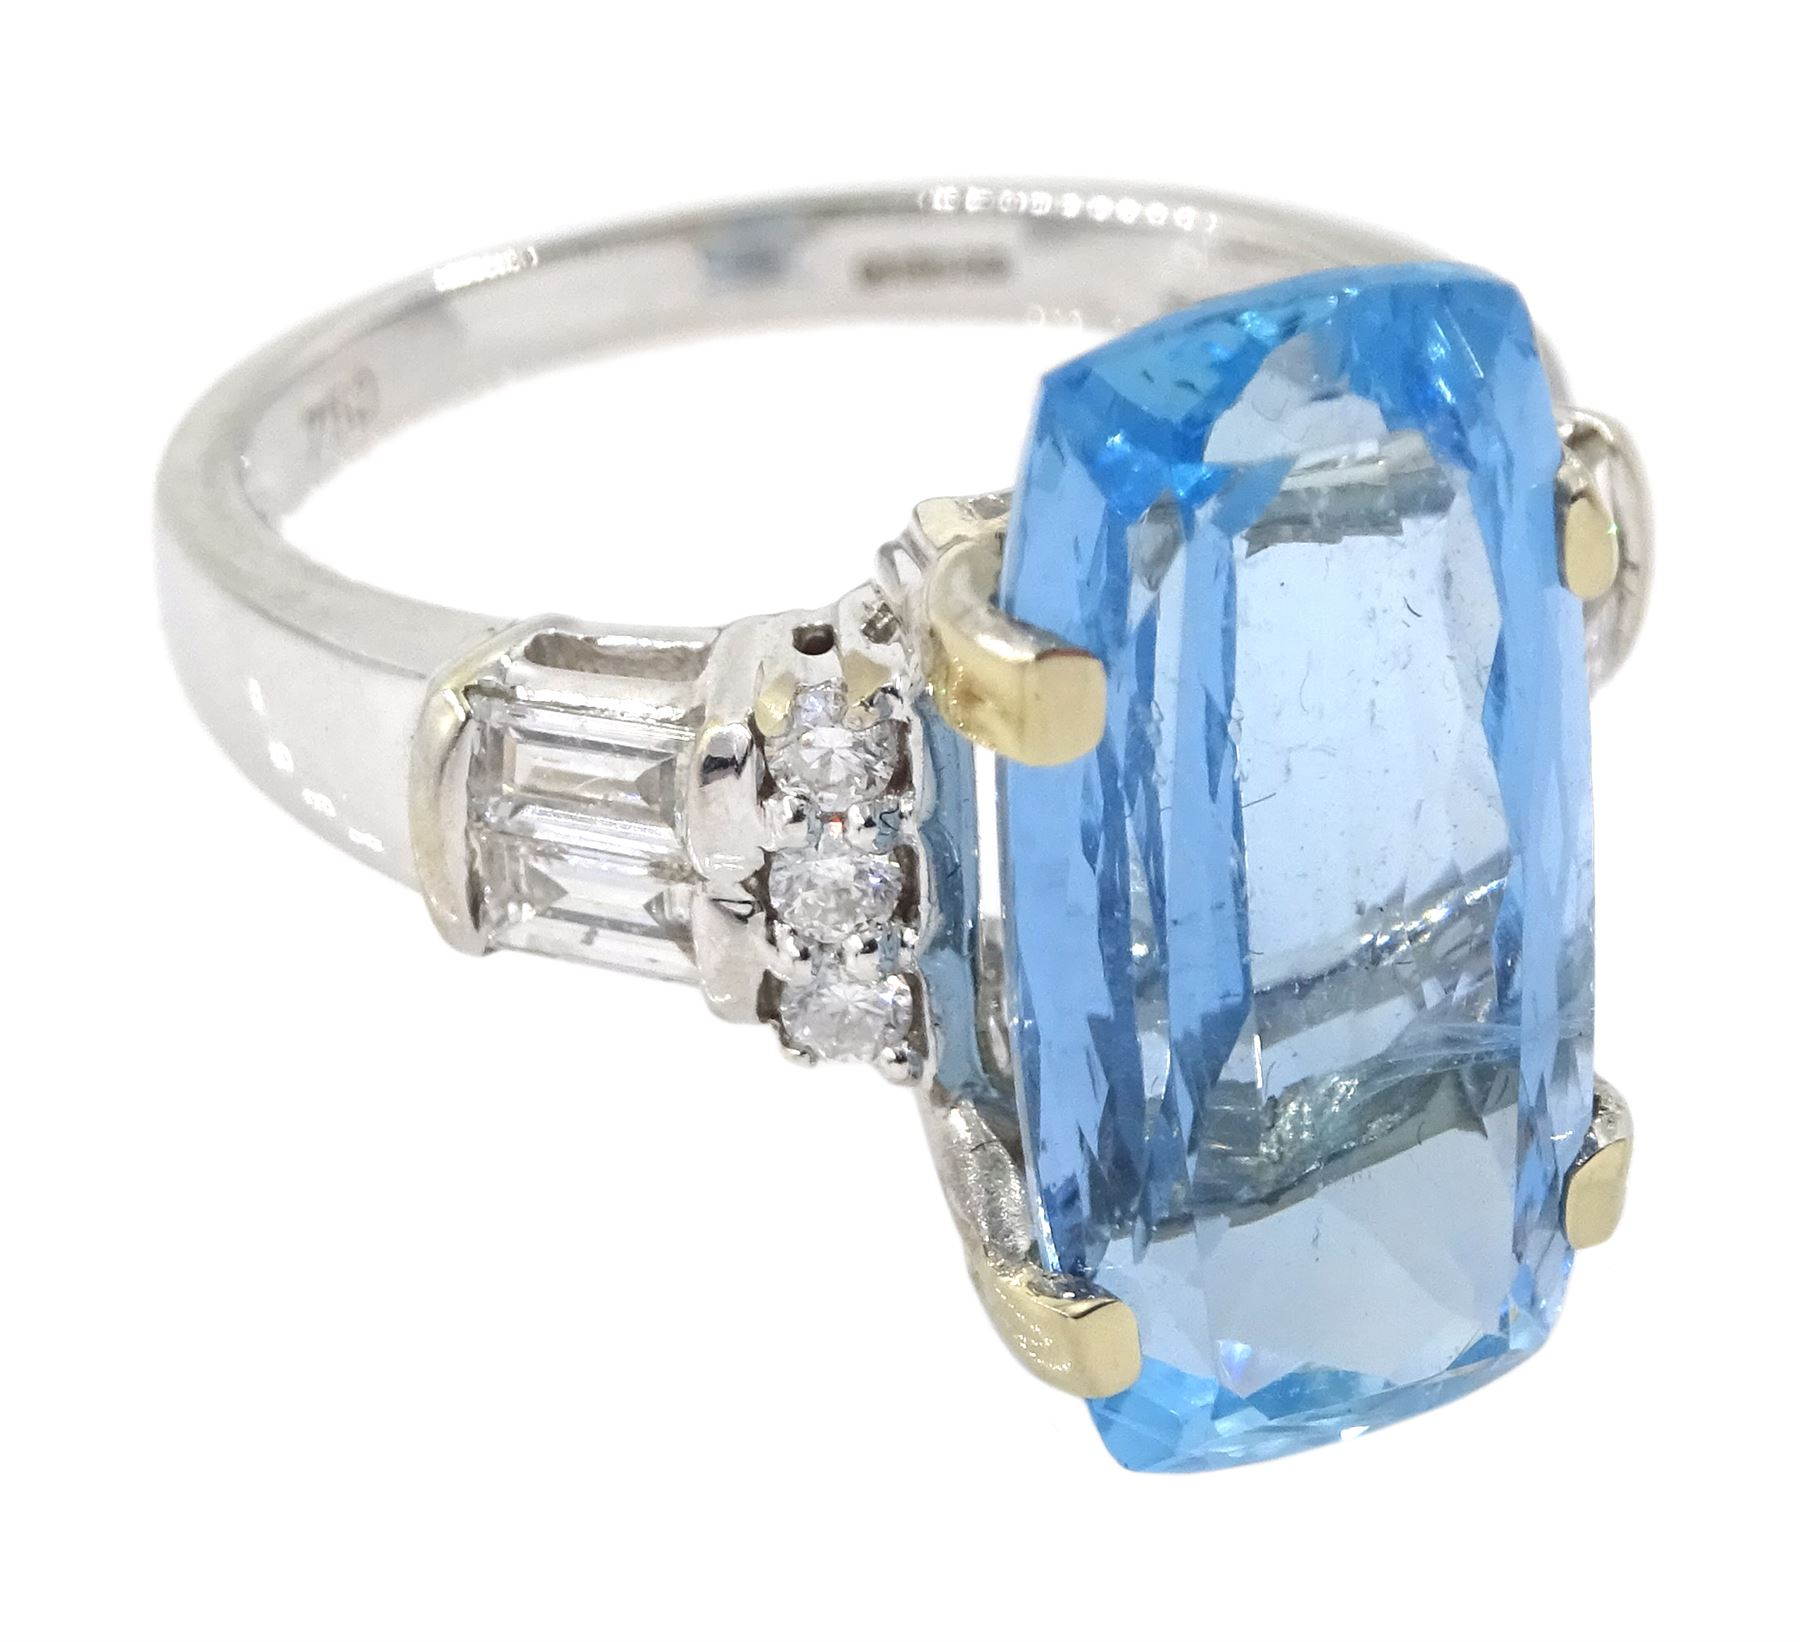 18ct white gold aquamarine ring - Image 3 of 4